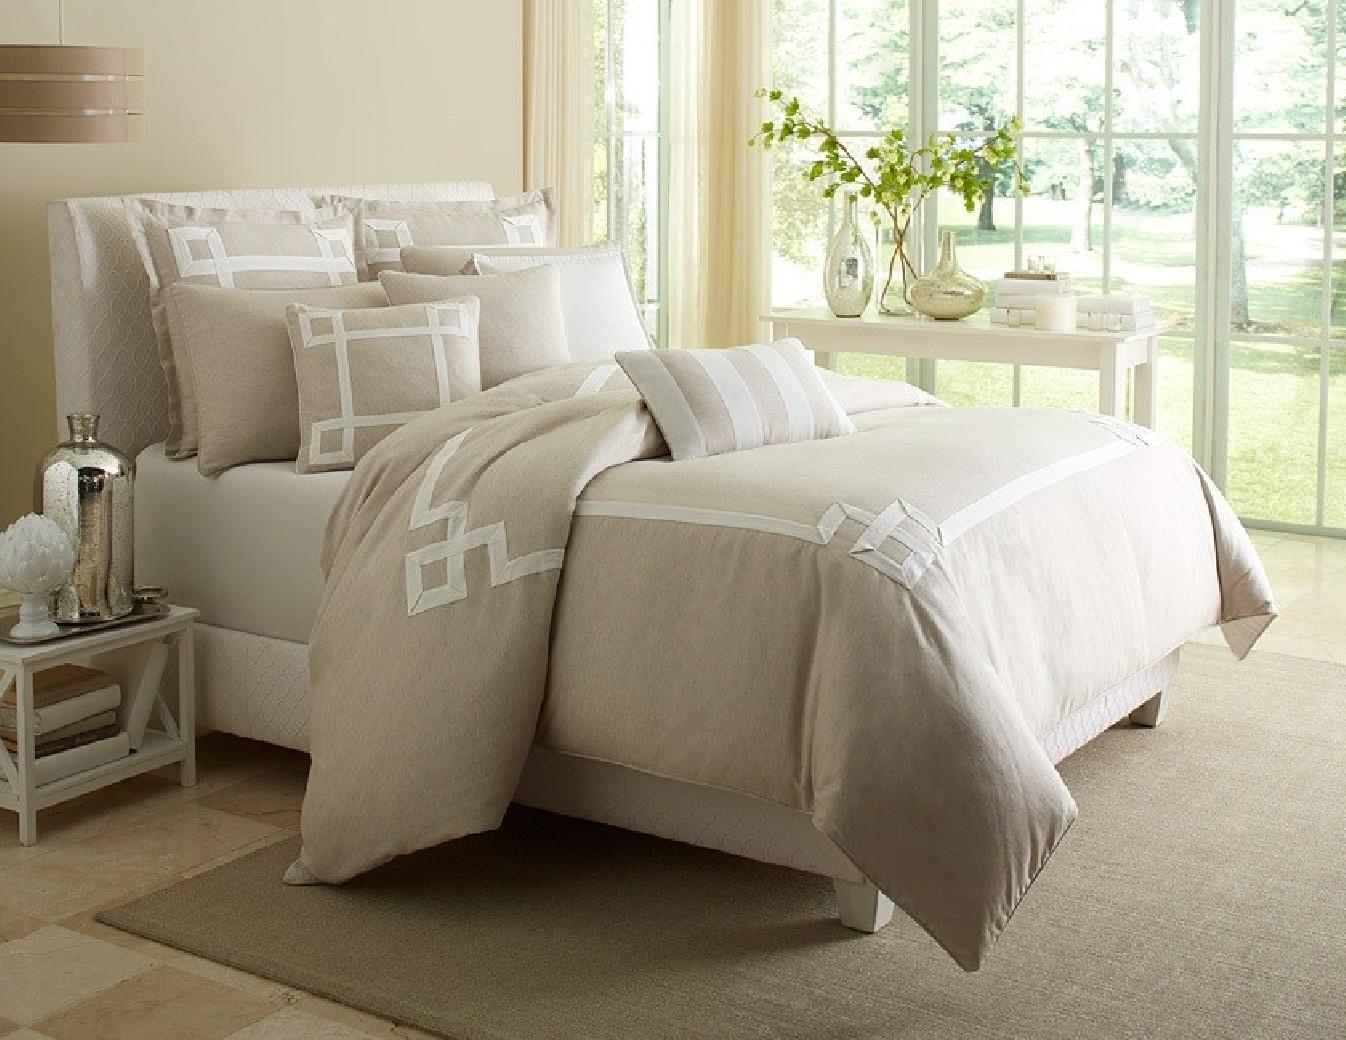 michael amini avenue comforter bedding setaico